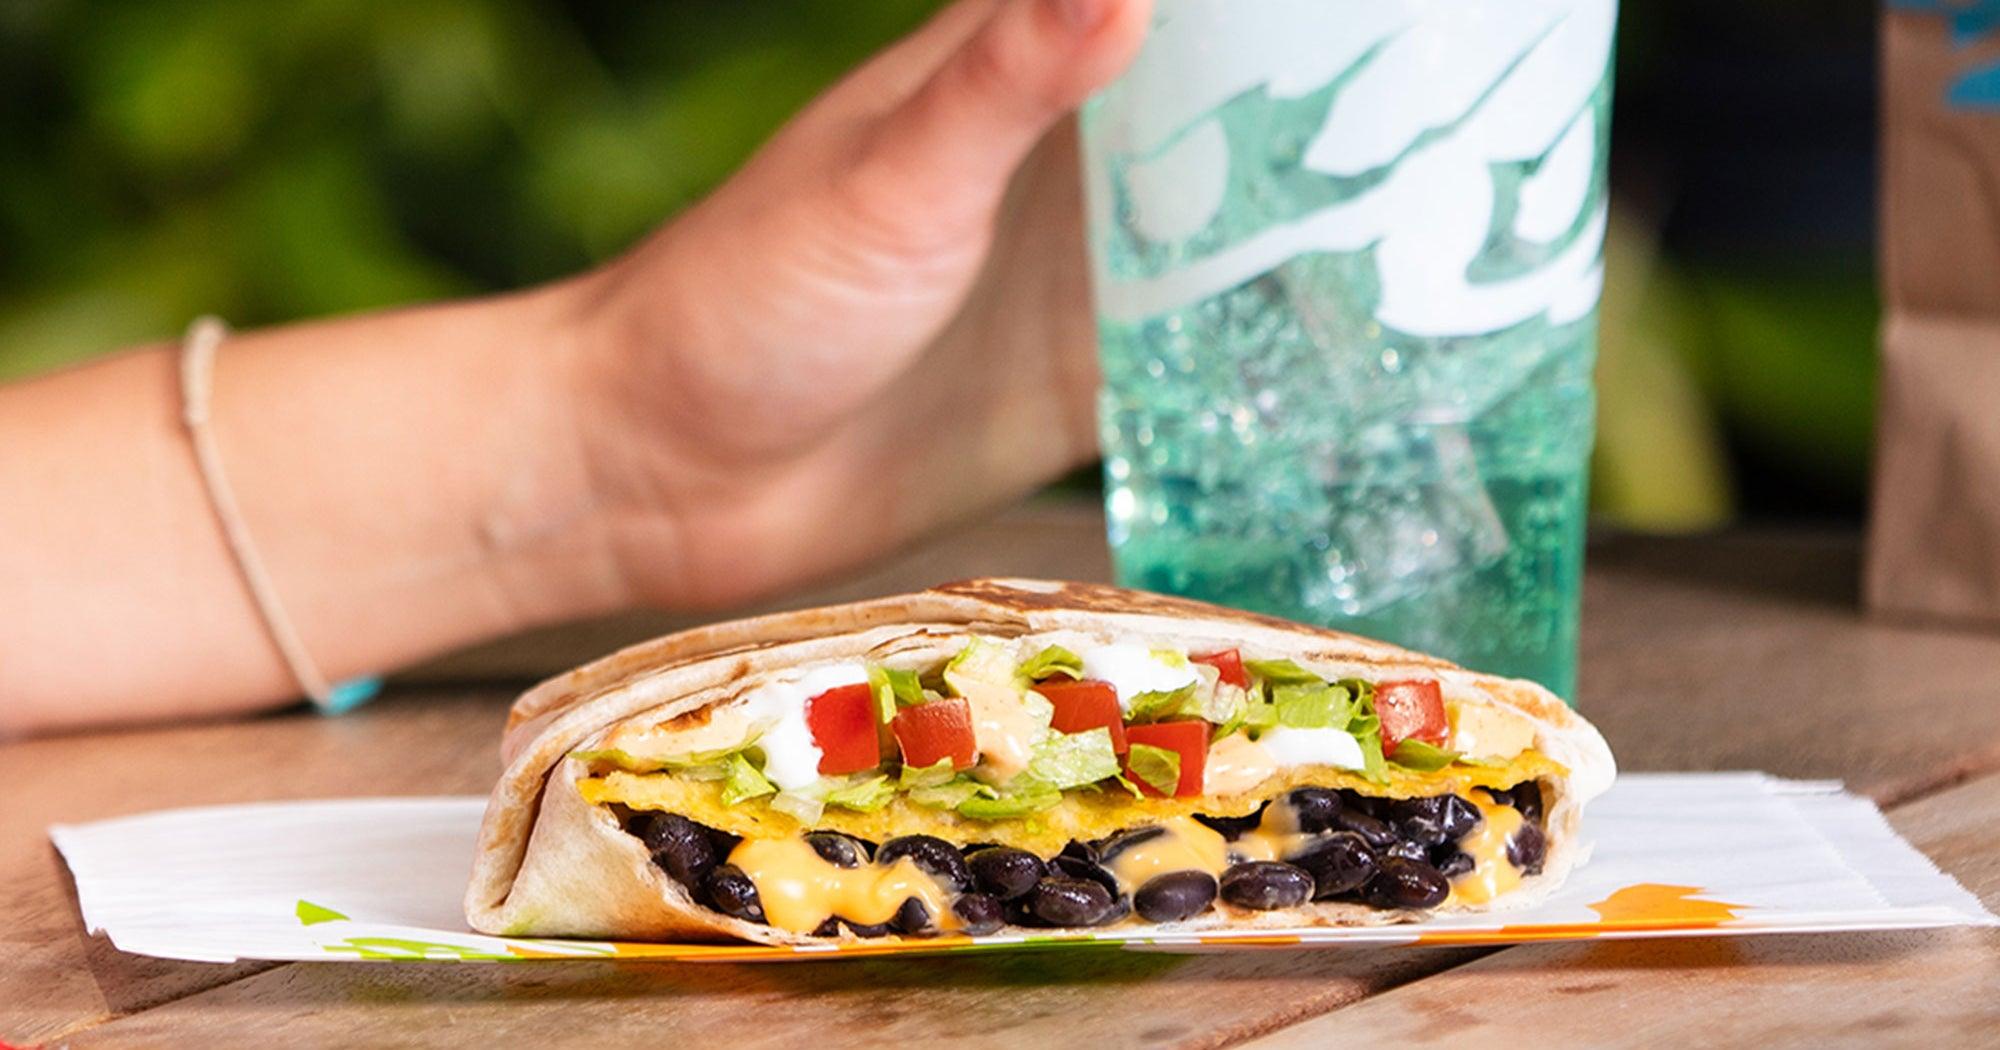 Taco Bell's New Vegetarian Menu Is Fast Food Goals